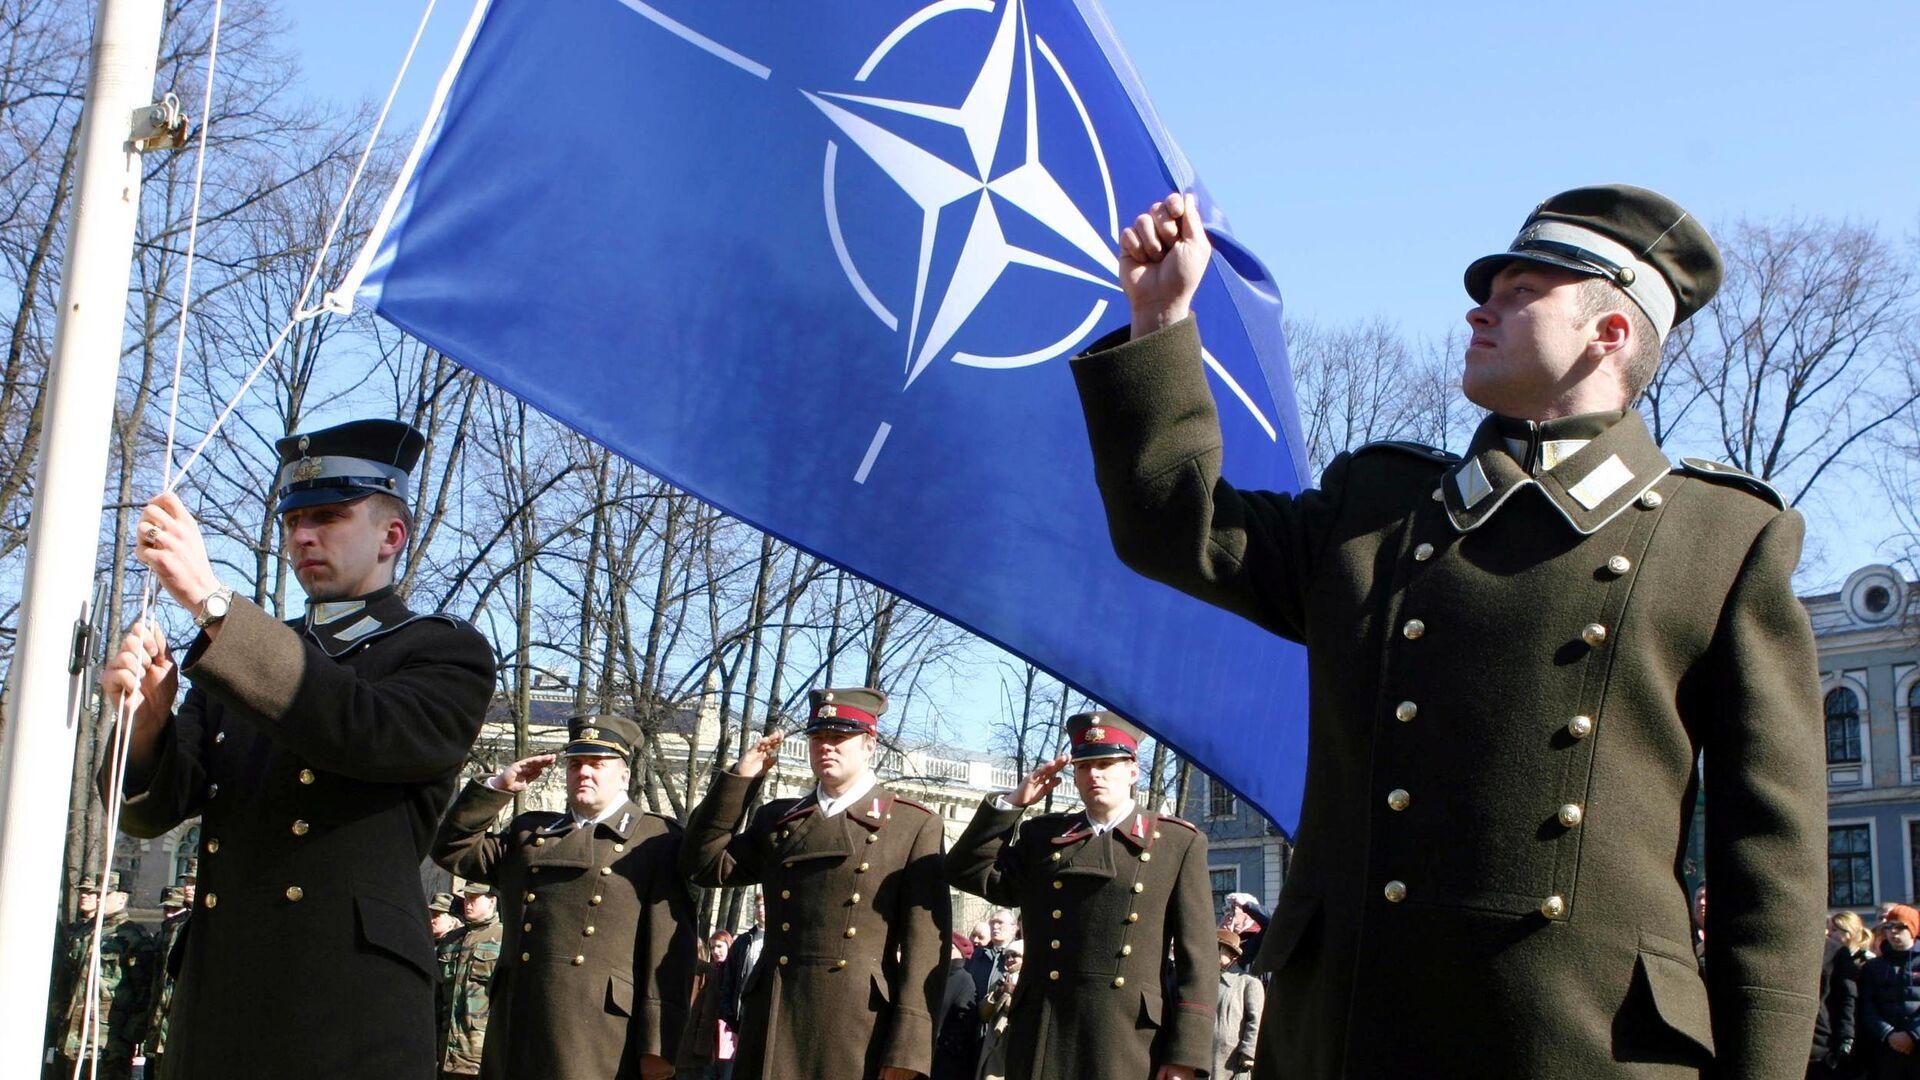 Letonski vojnici sa NATO zastavom - Sputnik Srbija, 1920, 08.08.2021